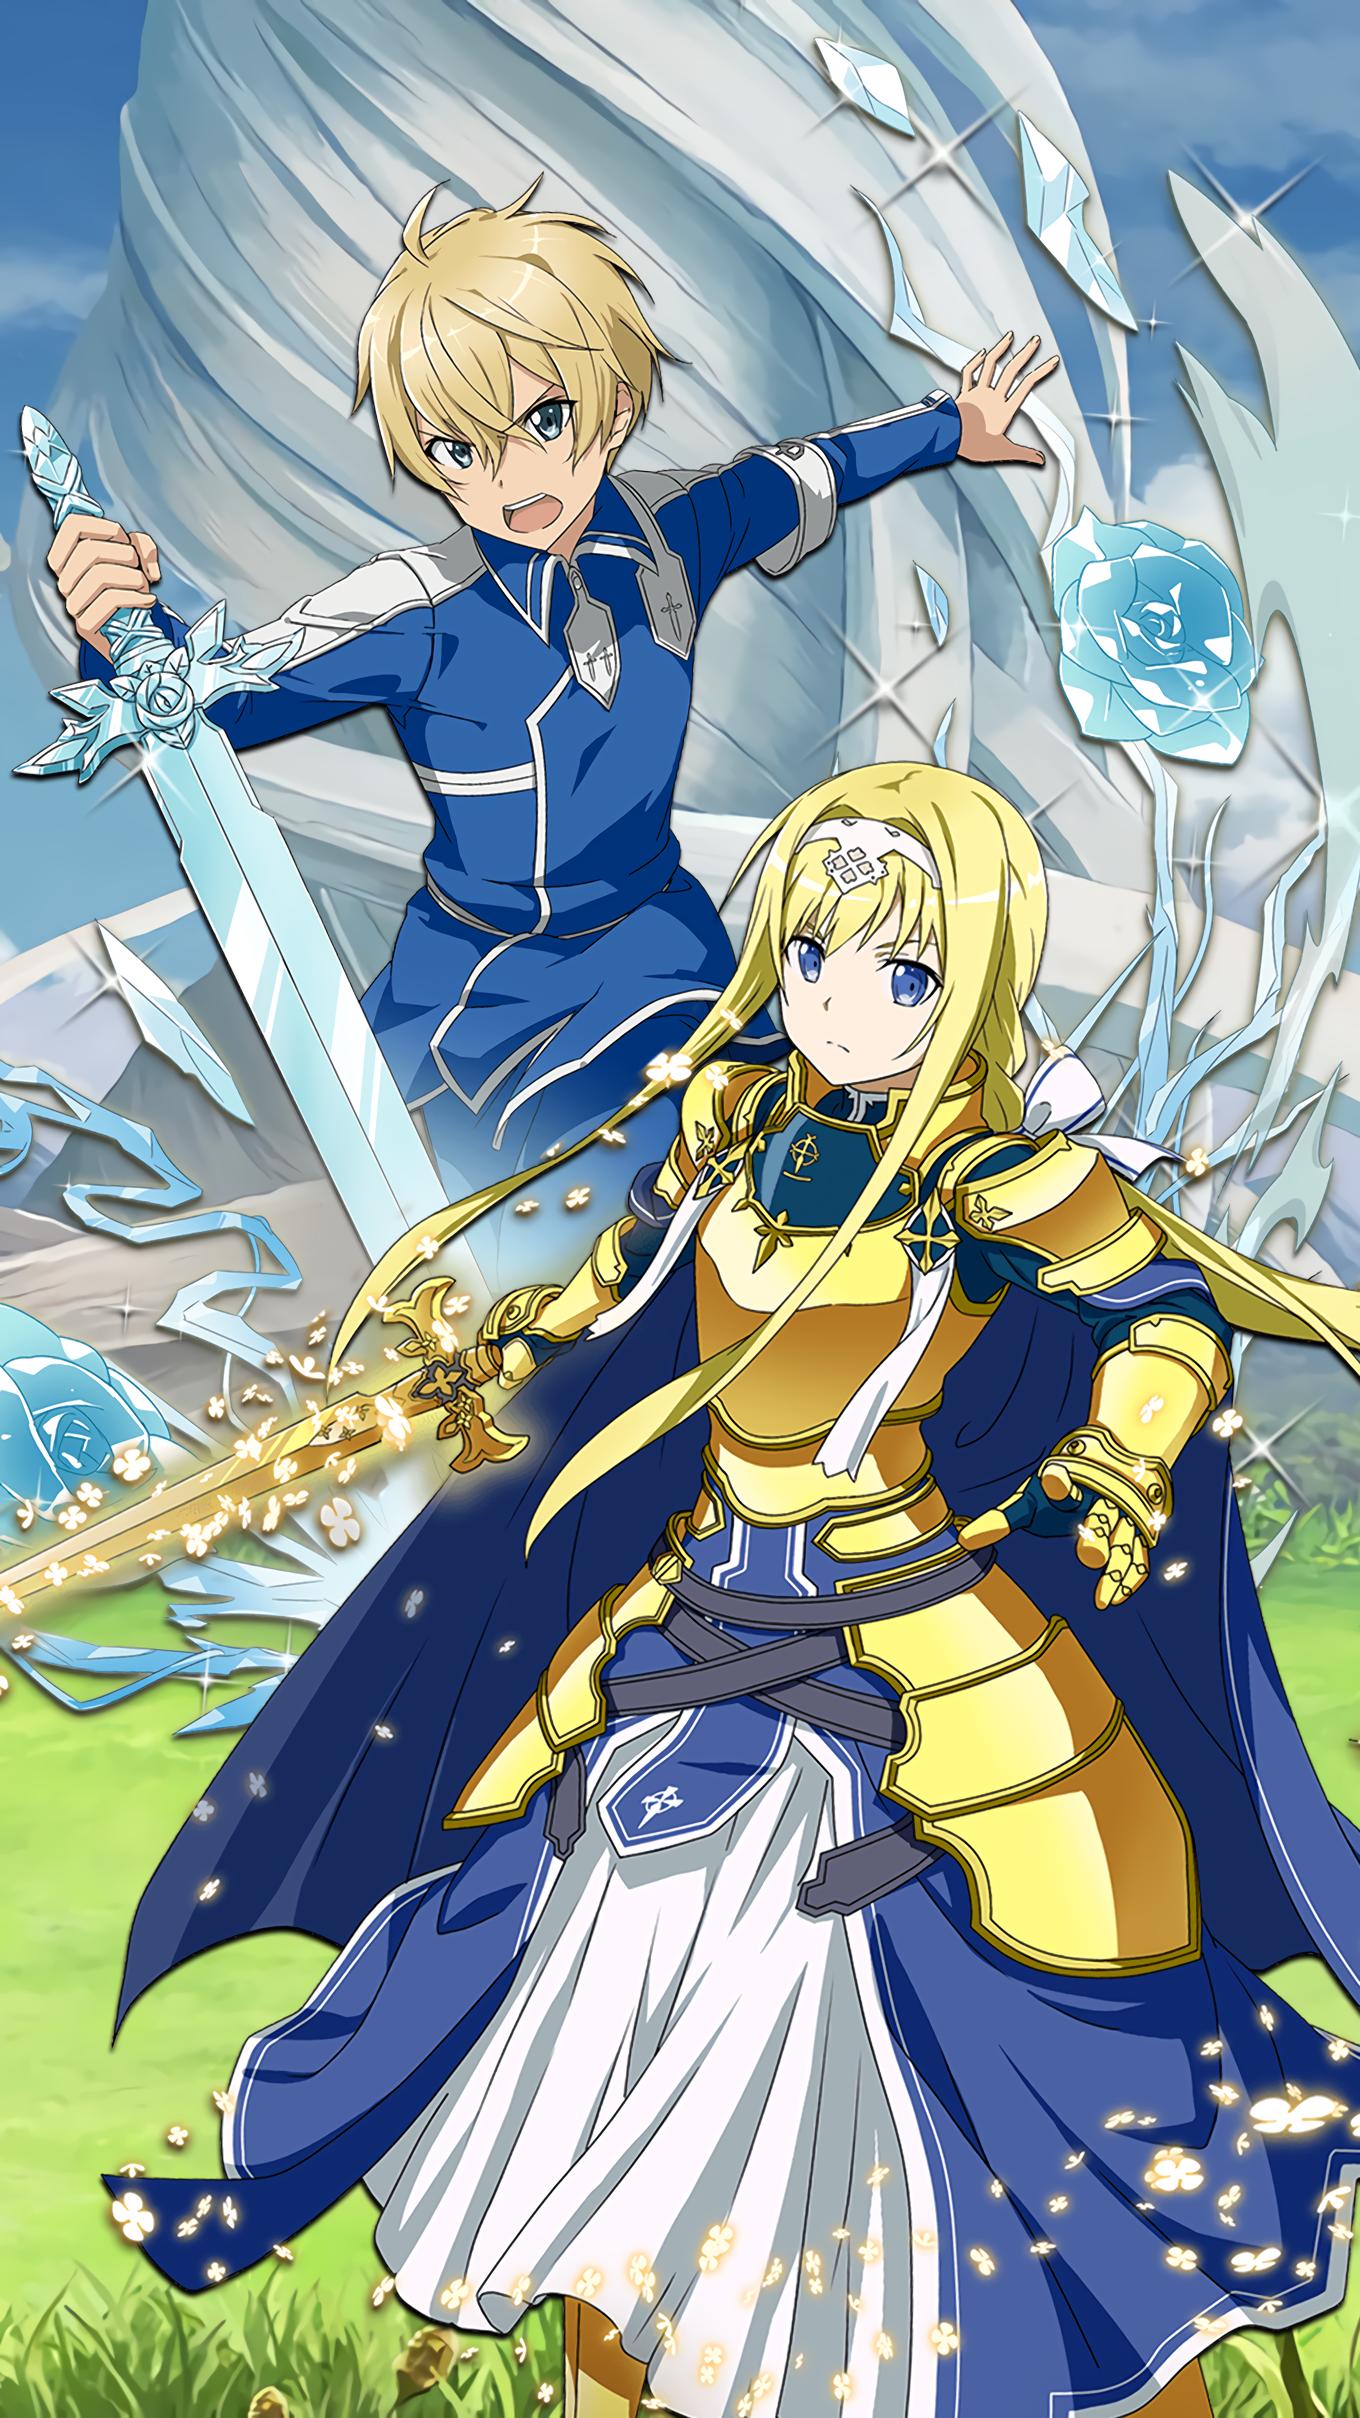 Sword Art Online Alicization Wallpaper Mobile 2257063